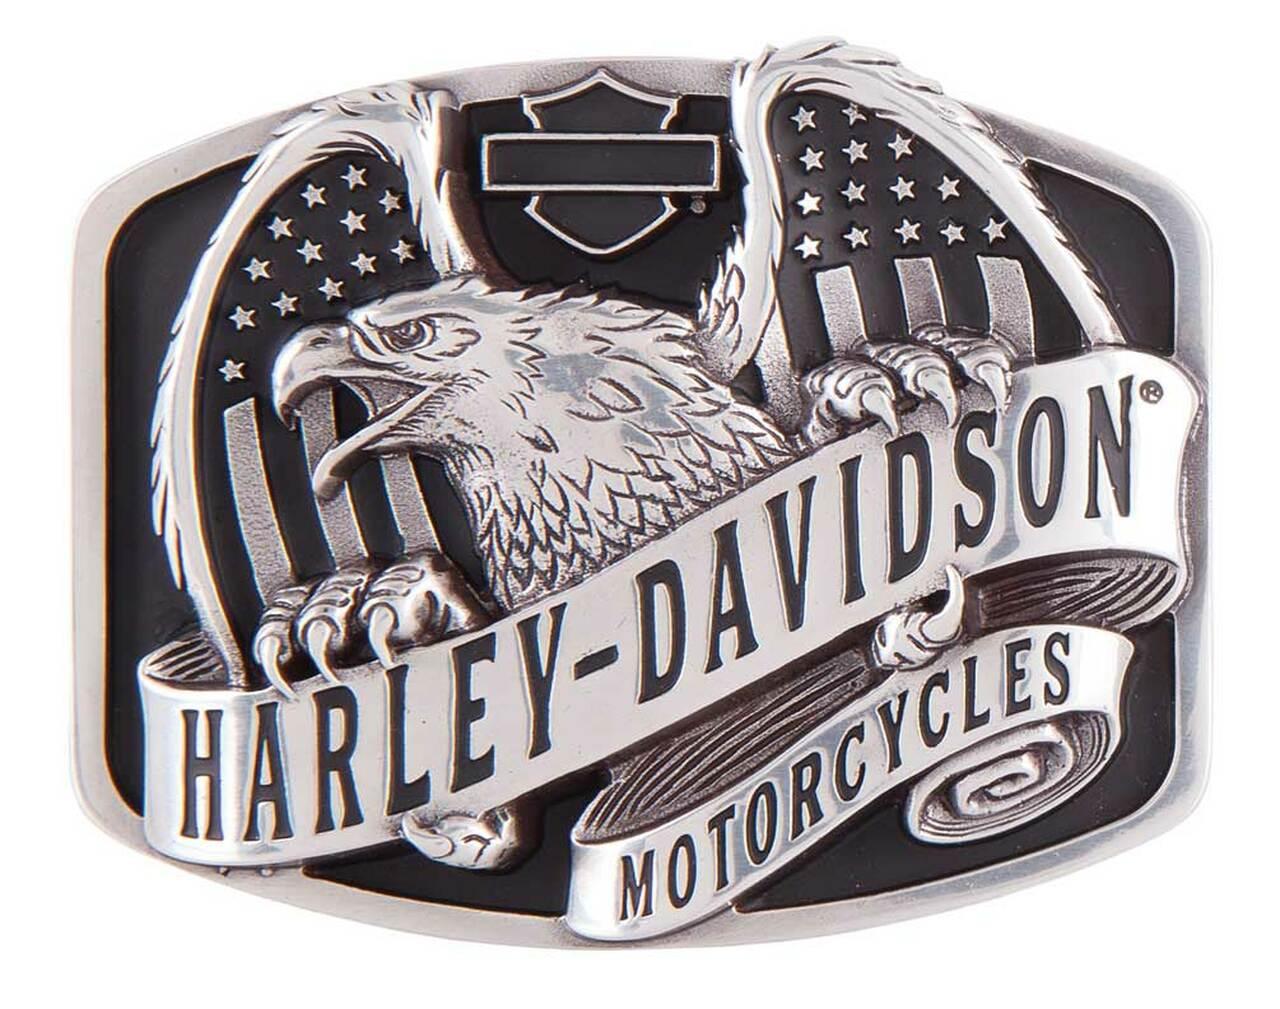 HARLEY DAVIDSON WINGS OVER AMERICA BUCKLE